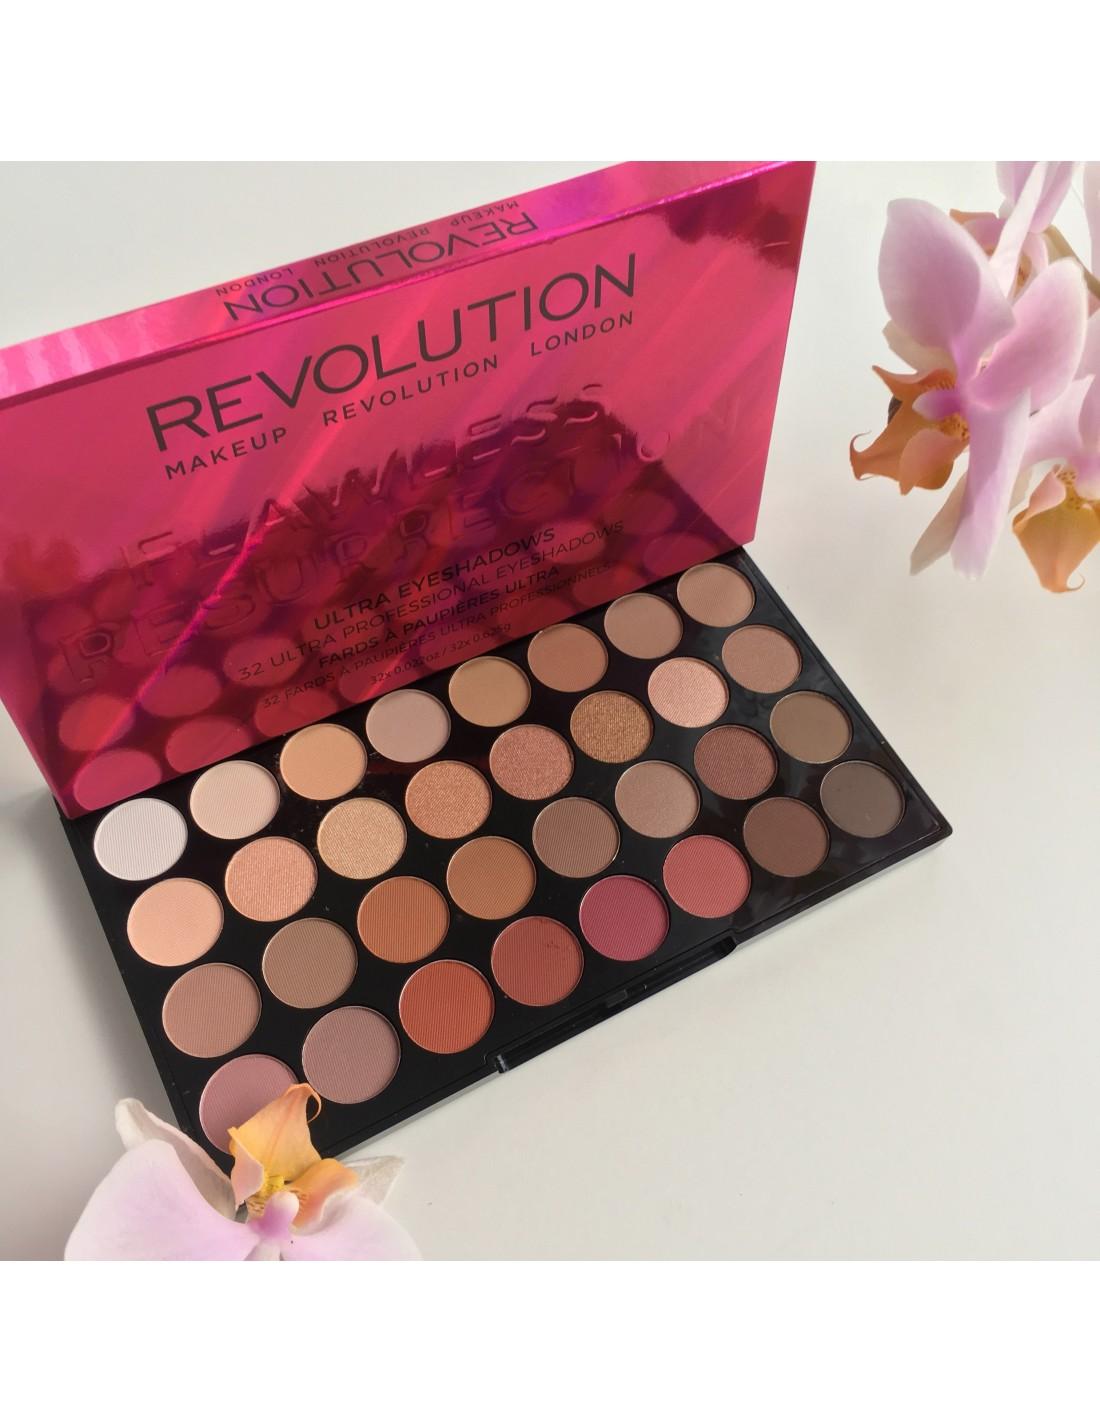 Makeup revolution flawless 3 resurrection opinie